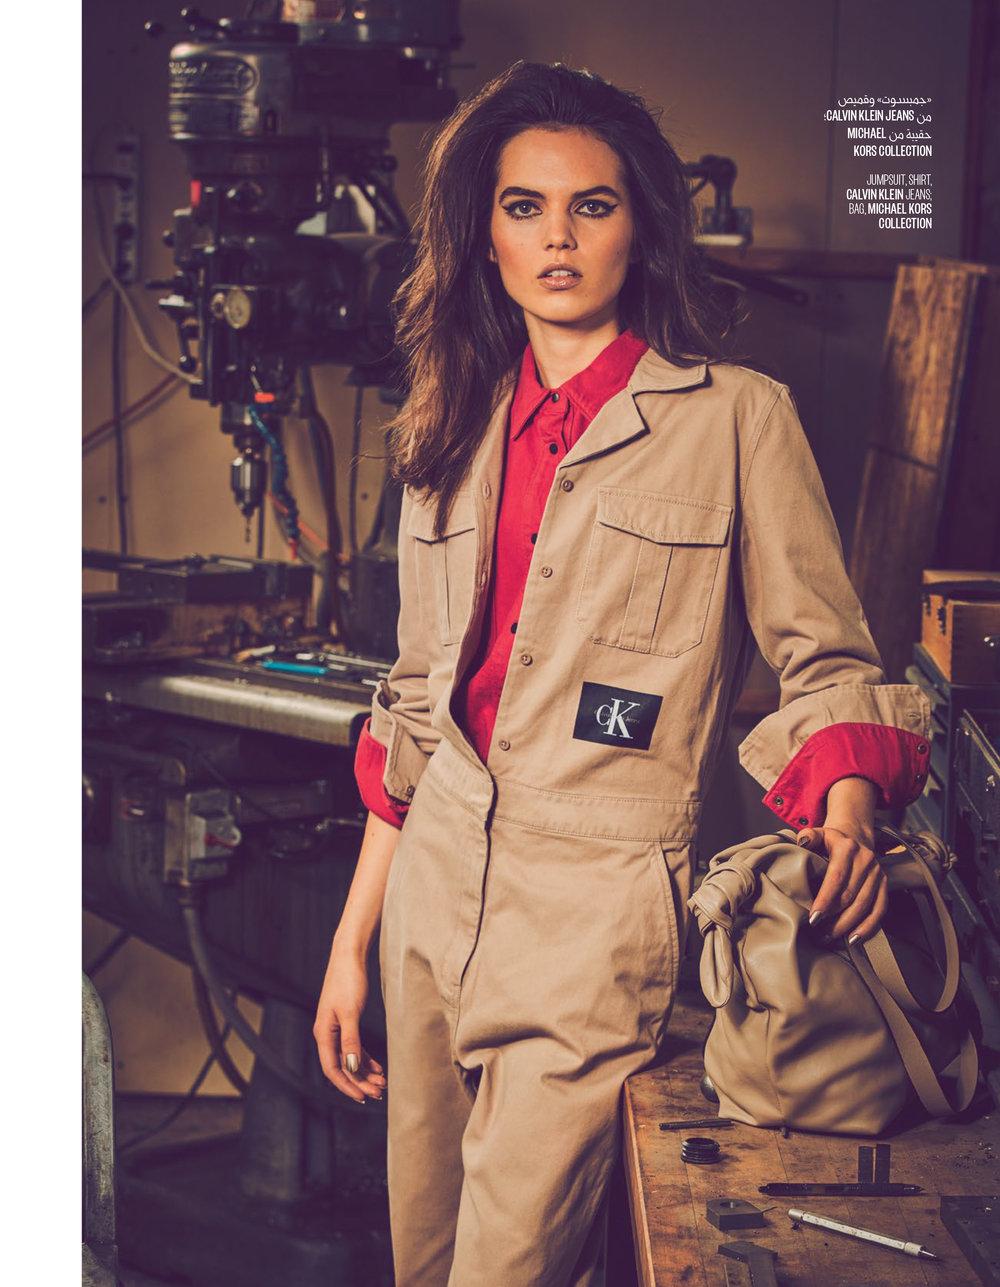 Vogue Arabia March 18 Final Binder_Magzter (dragged) 3-8.jpg